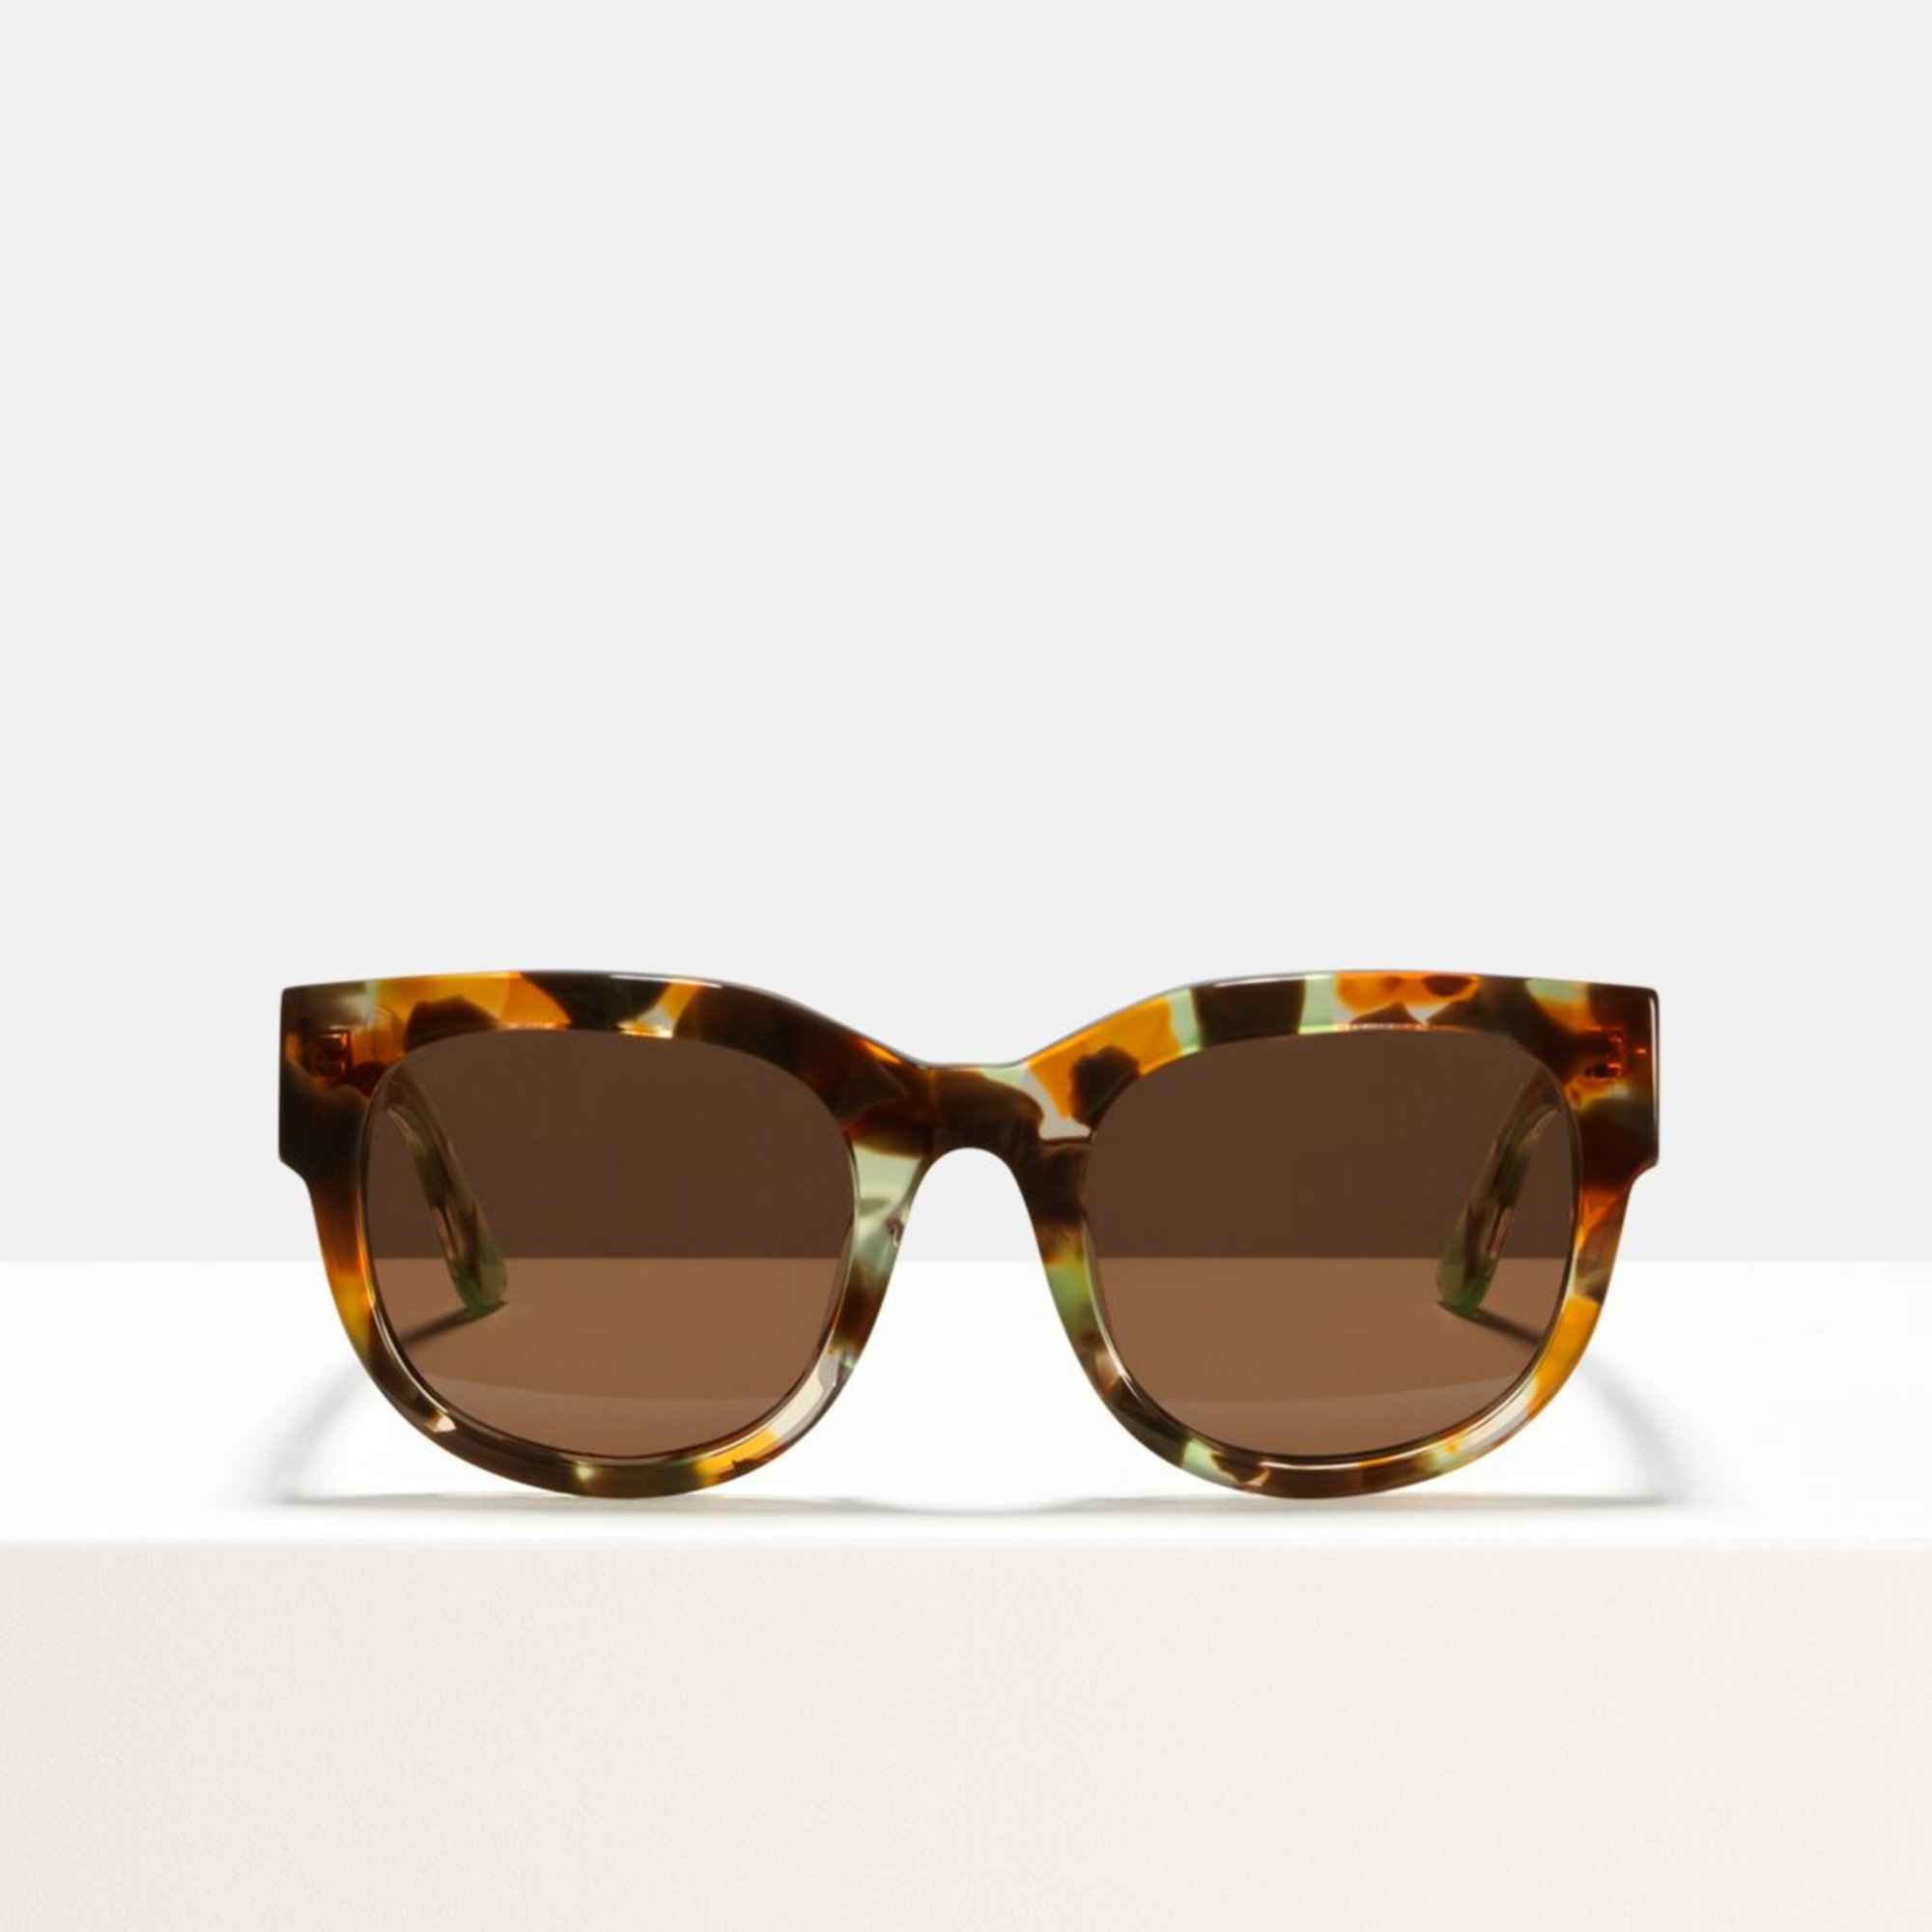 Ace & Tate Sunglasses   round acetate in Brown, Green, Orange